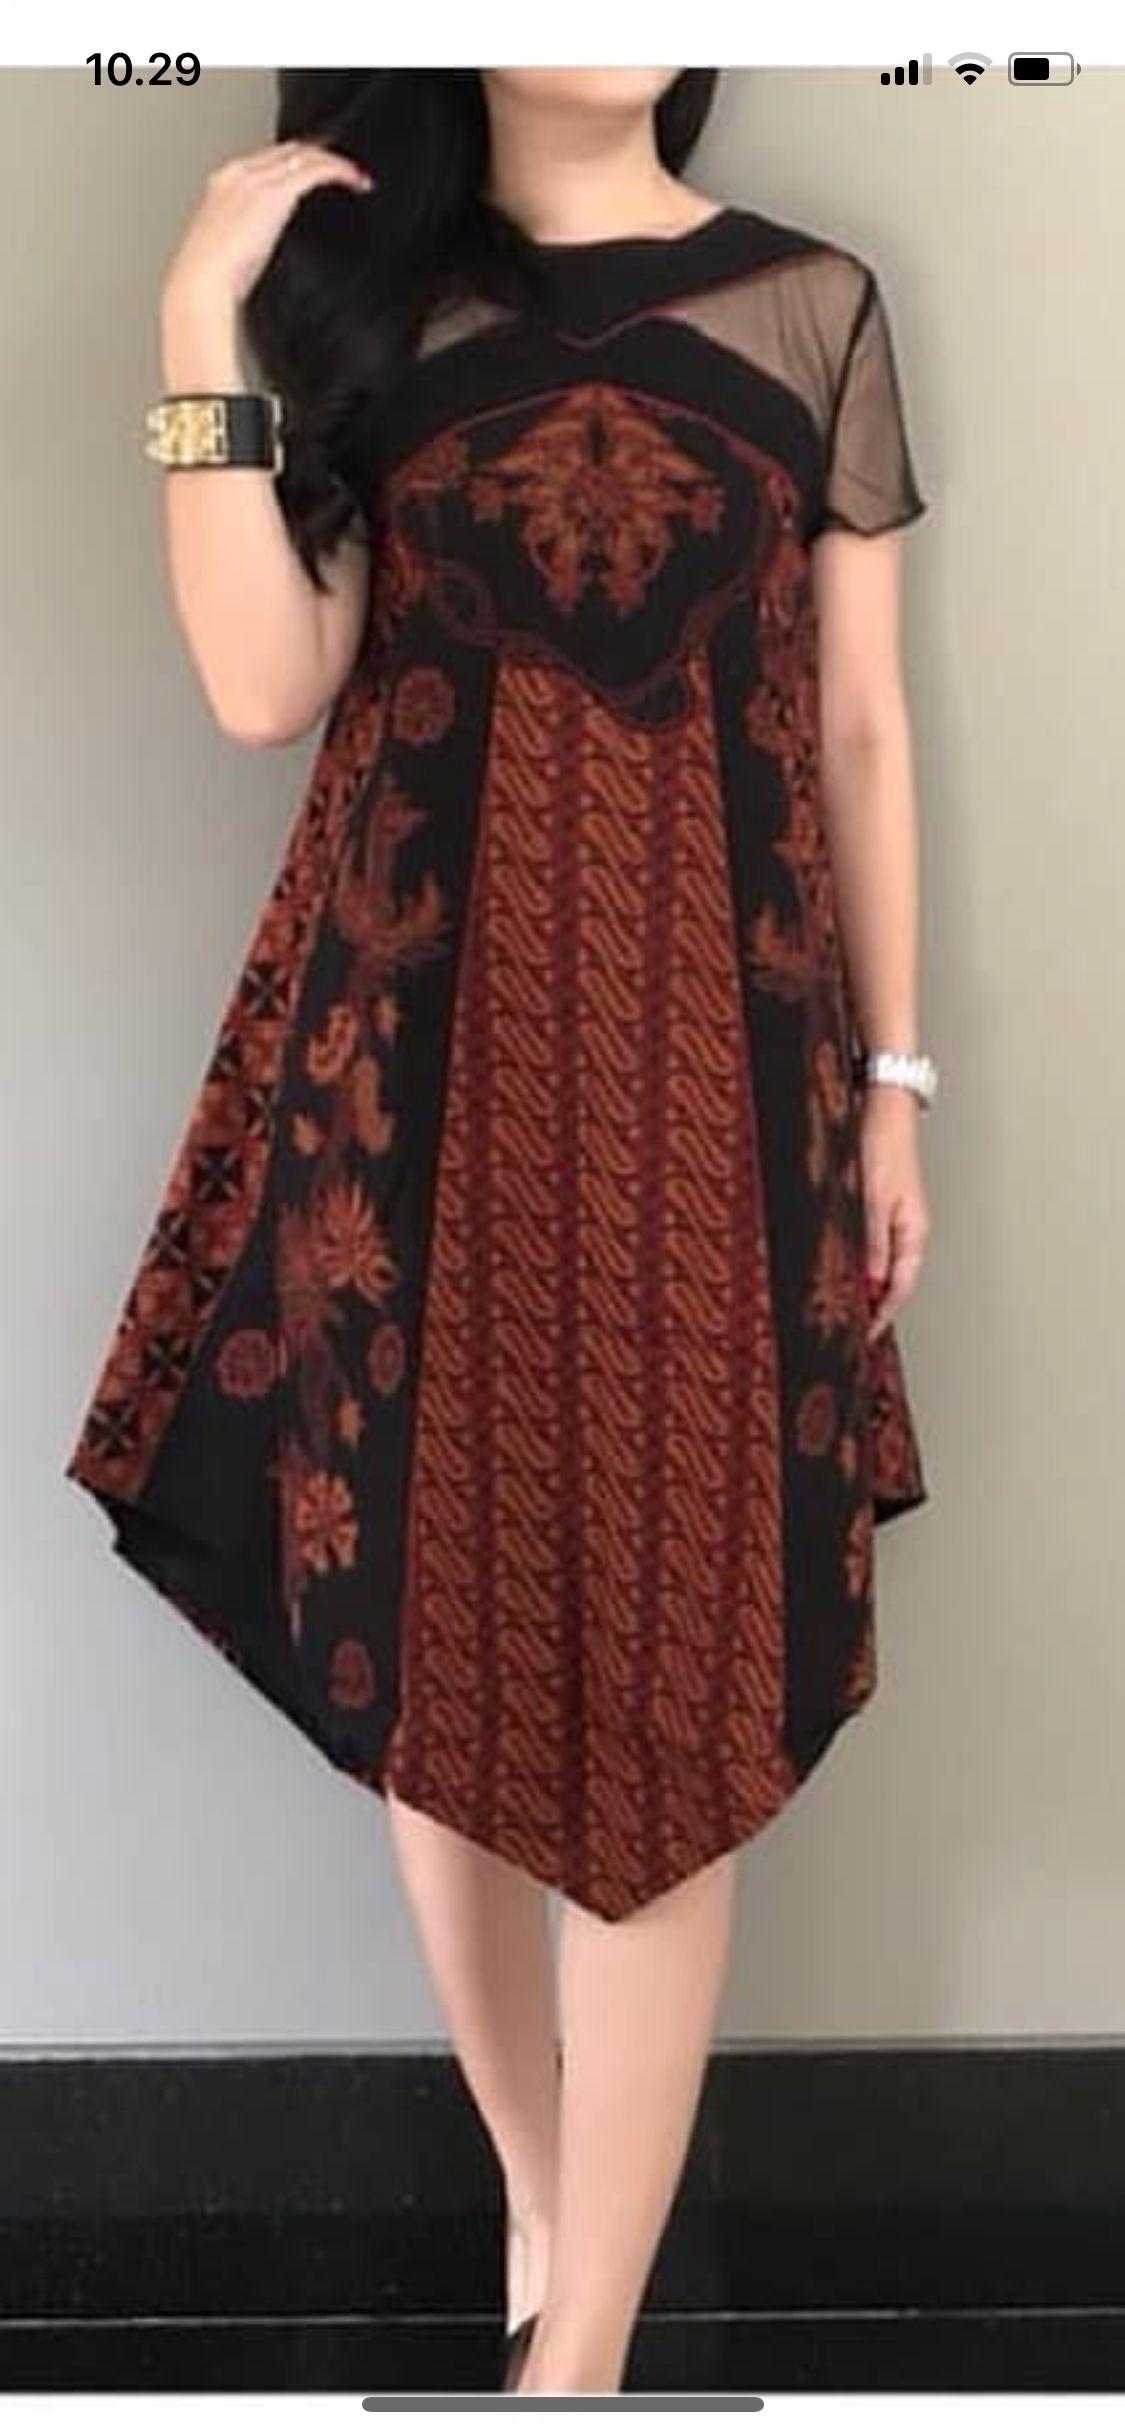 gambar batik oleh sinta wanita model baju wanita model